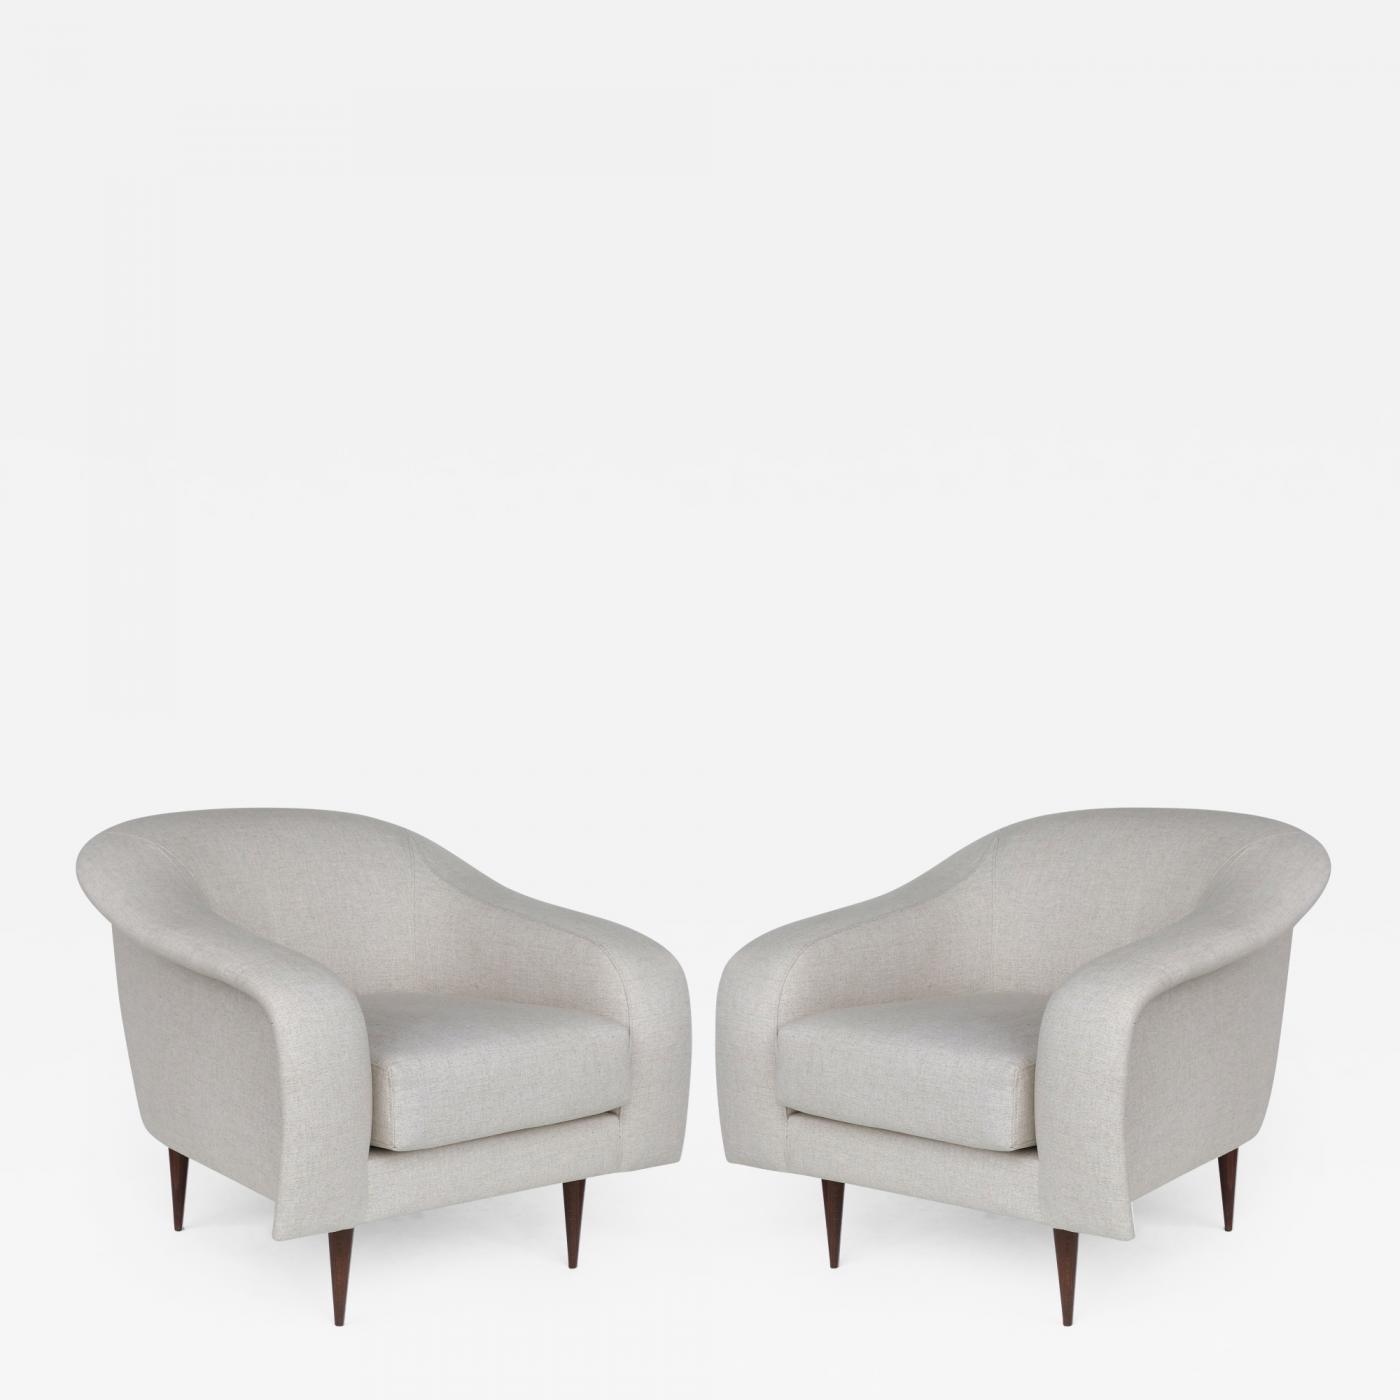 Stupendous Joaquim Tenreiro Brazilian Mid Century Modern Club Chairs By Joaquim Tenreiro Re Edition Gamerscity Chair Design For Home Gamerscityorg